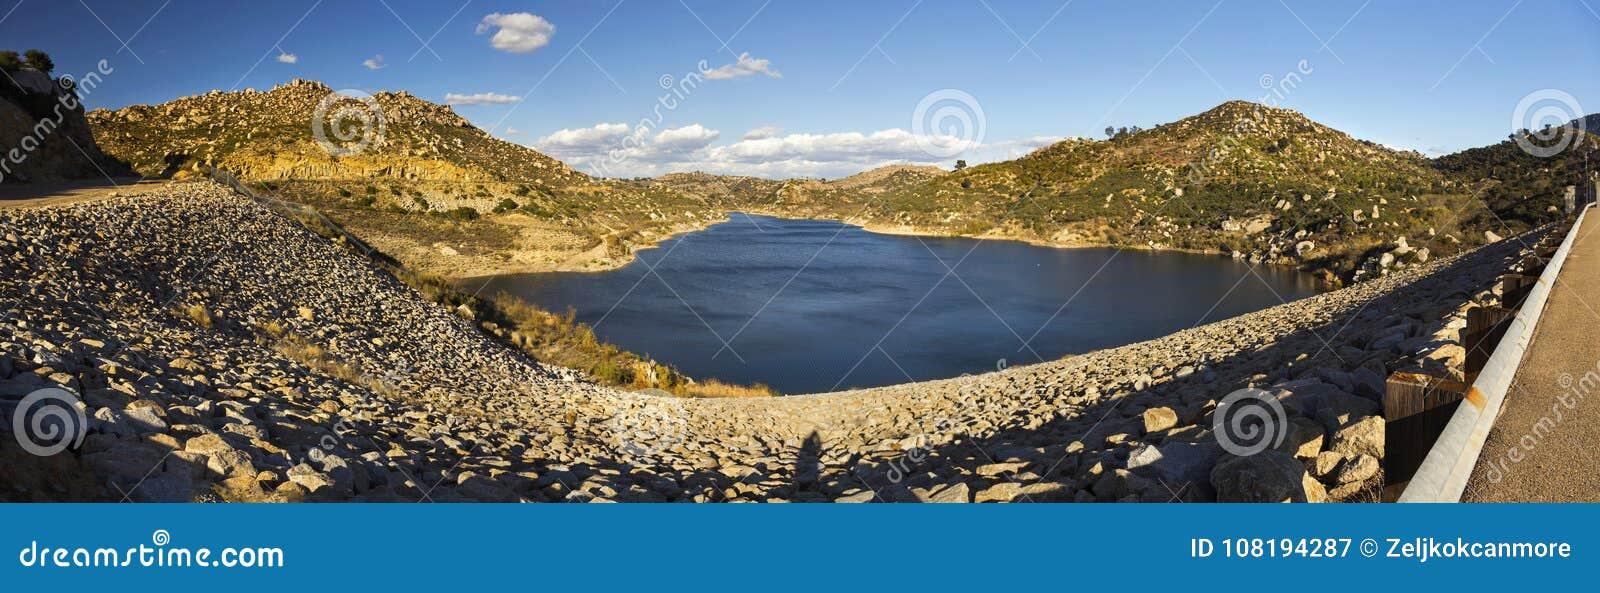 Lake Ramona Panorama Blue Sky Preserve Poway San Diego County Inland